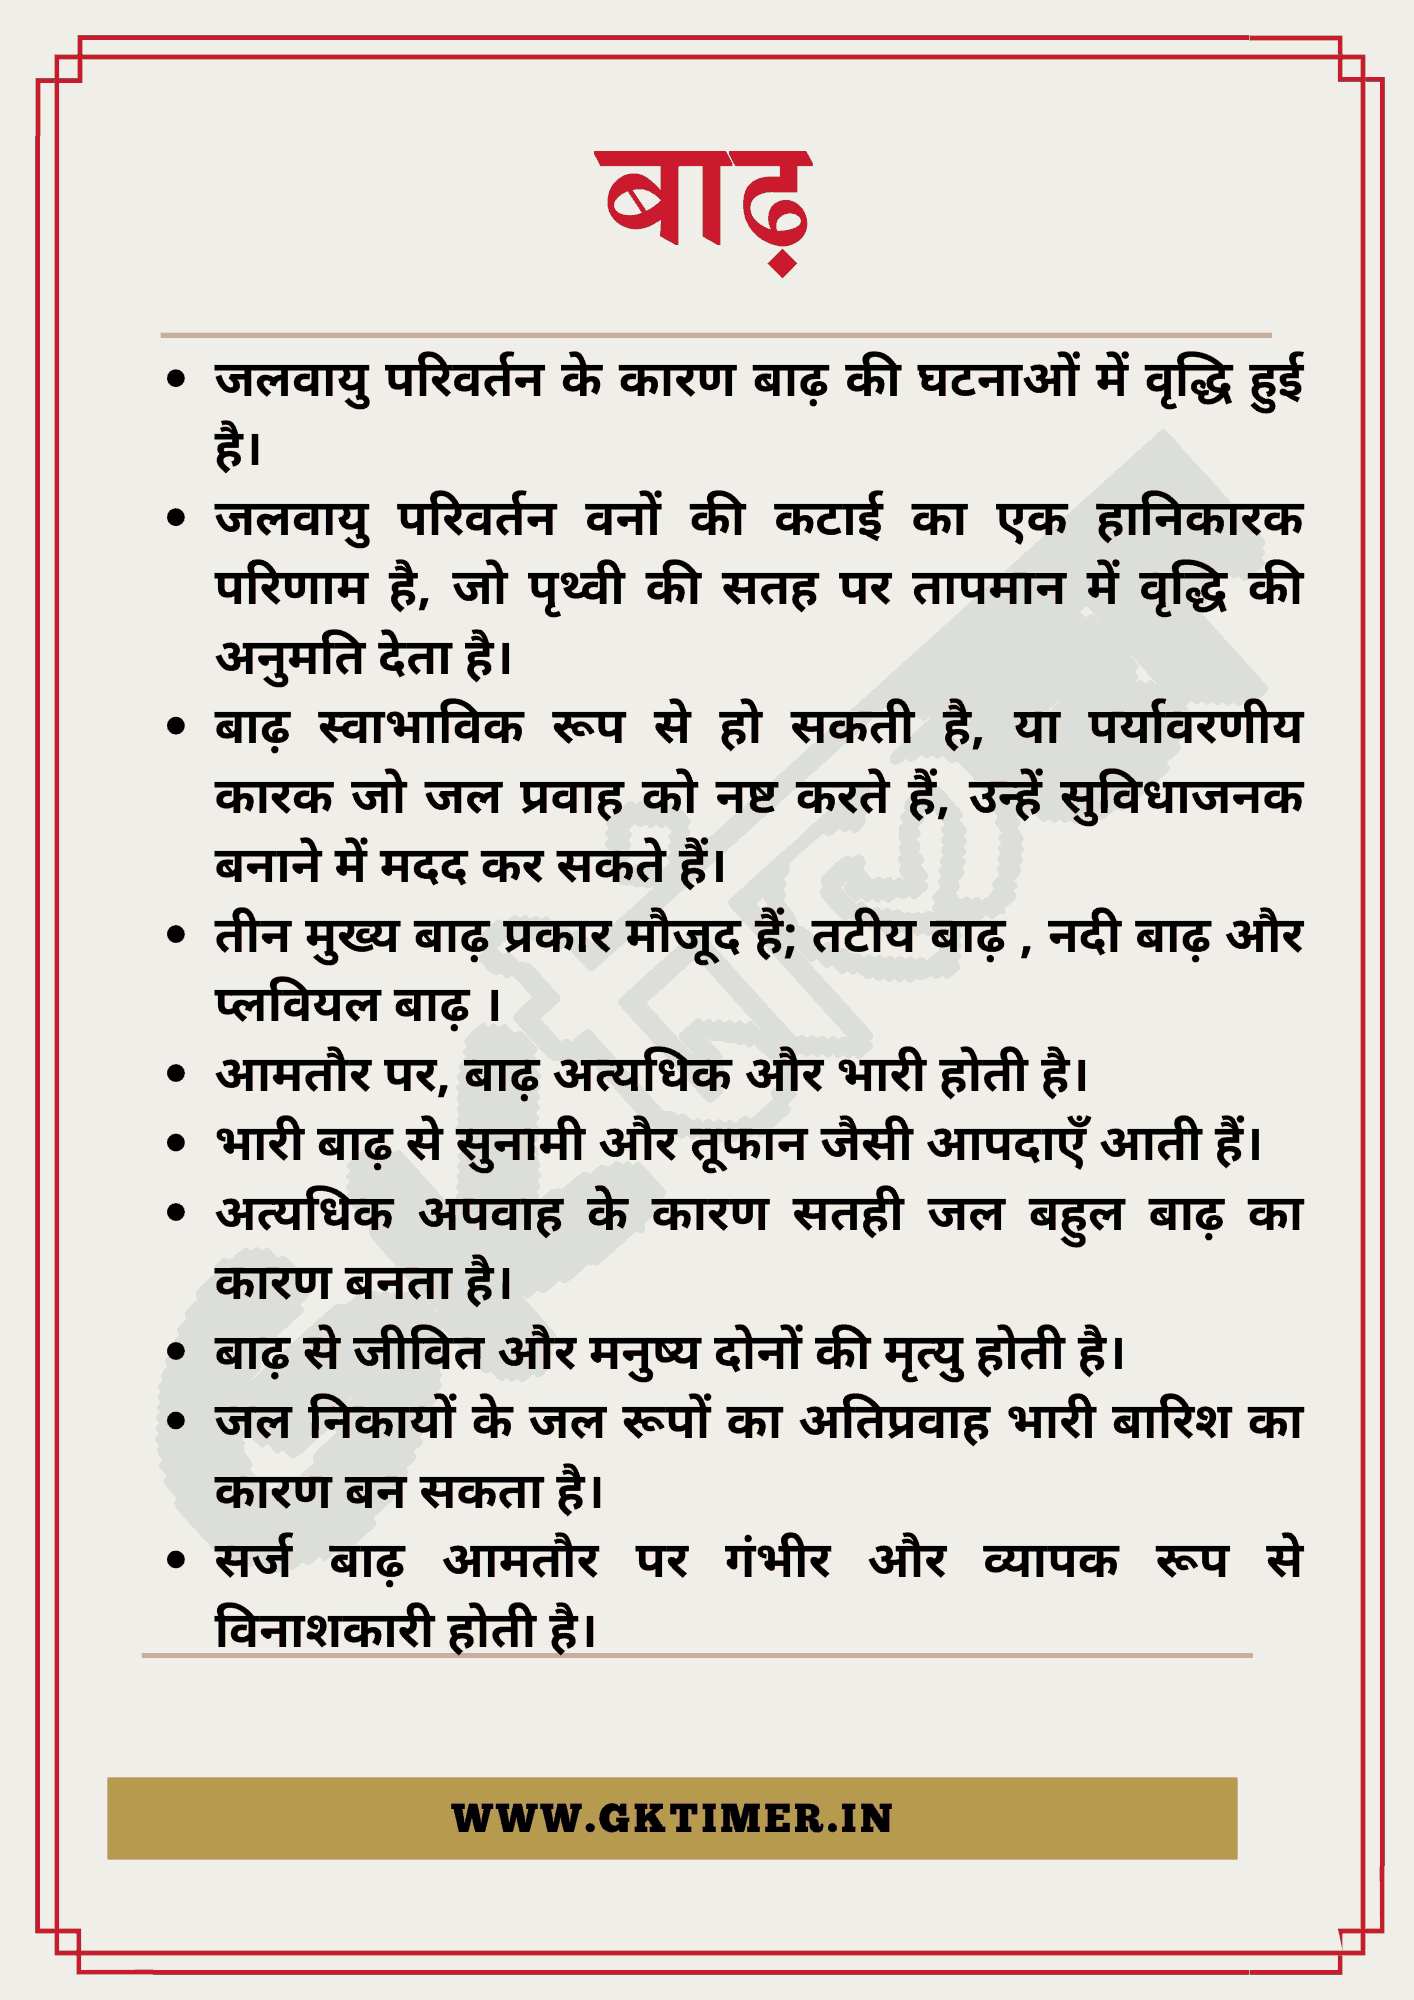 बाढ़ पर निबंध   Long and Short Essay on Flood in Hindi   10 Lines on Flood in Hindi